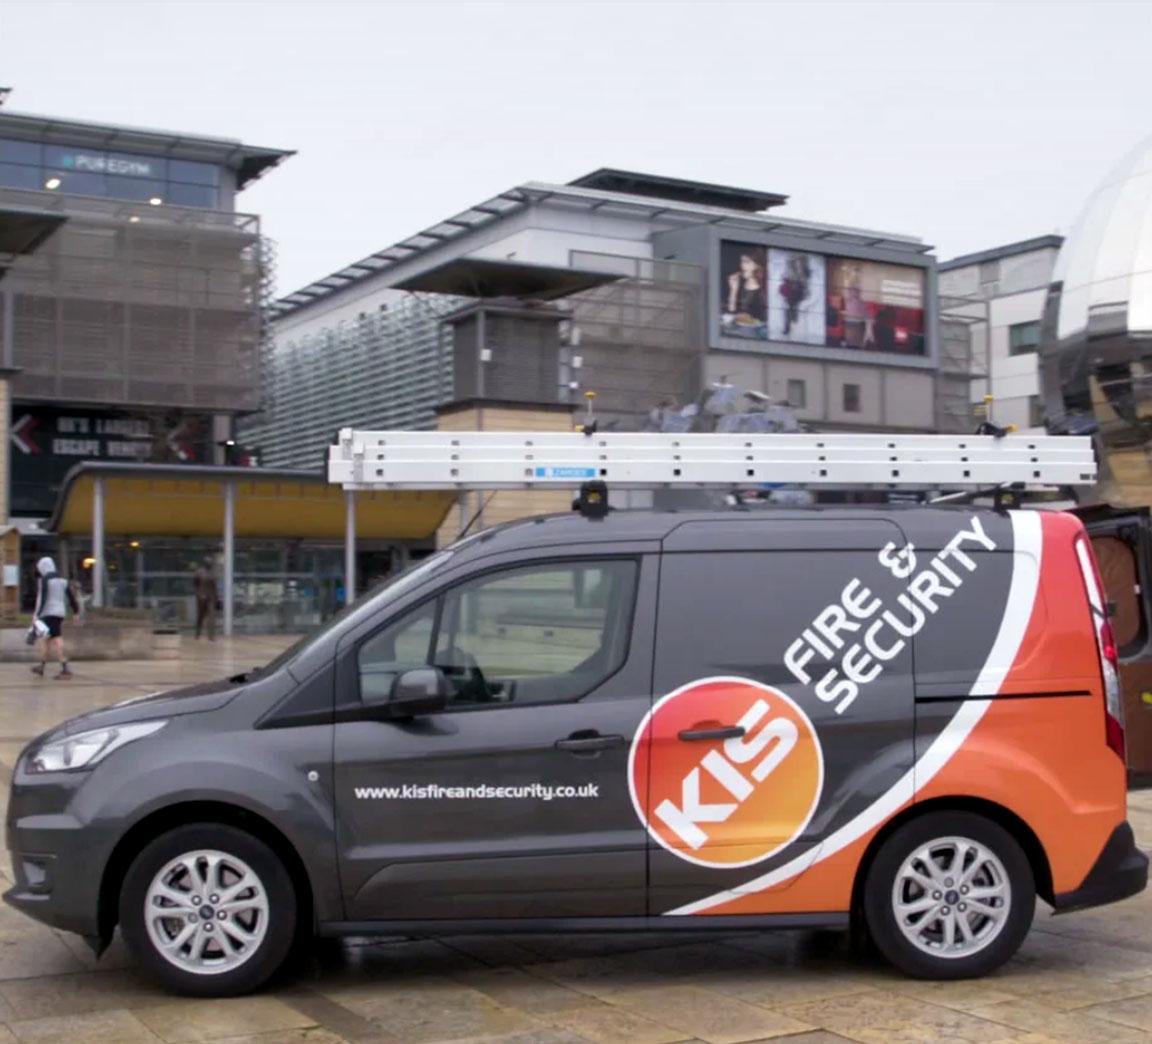 KIS Fire & Security van